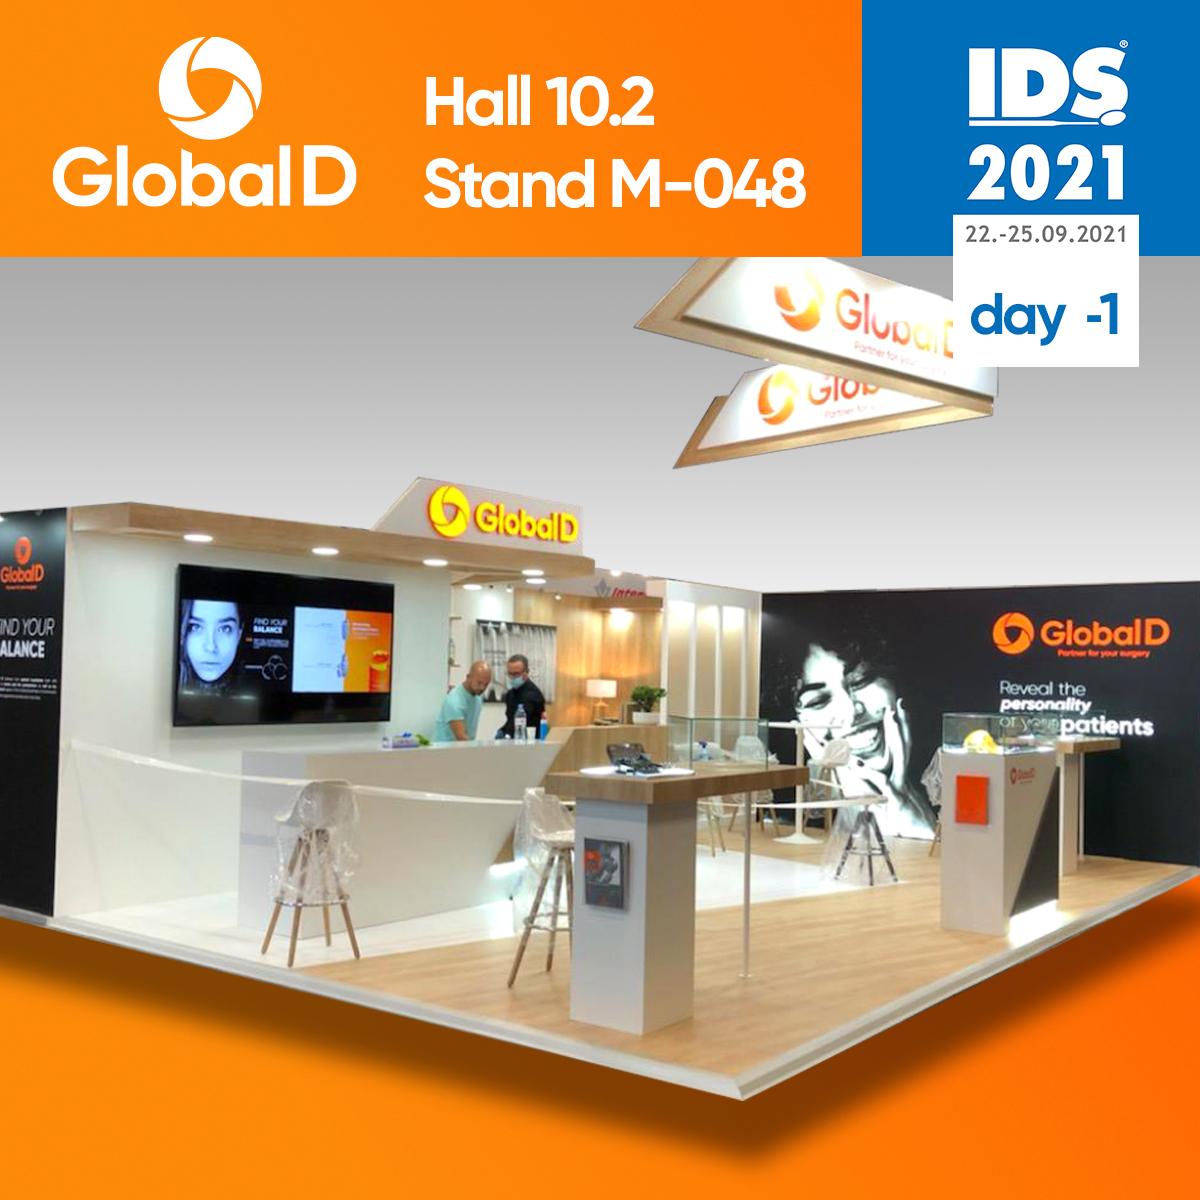 IDS 2021 avec Global D